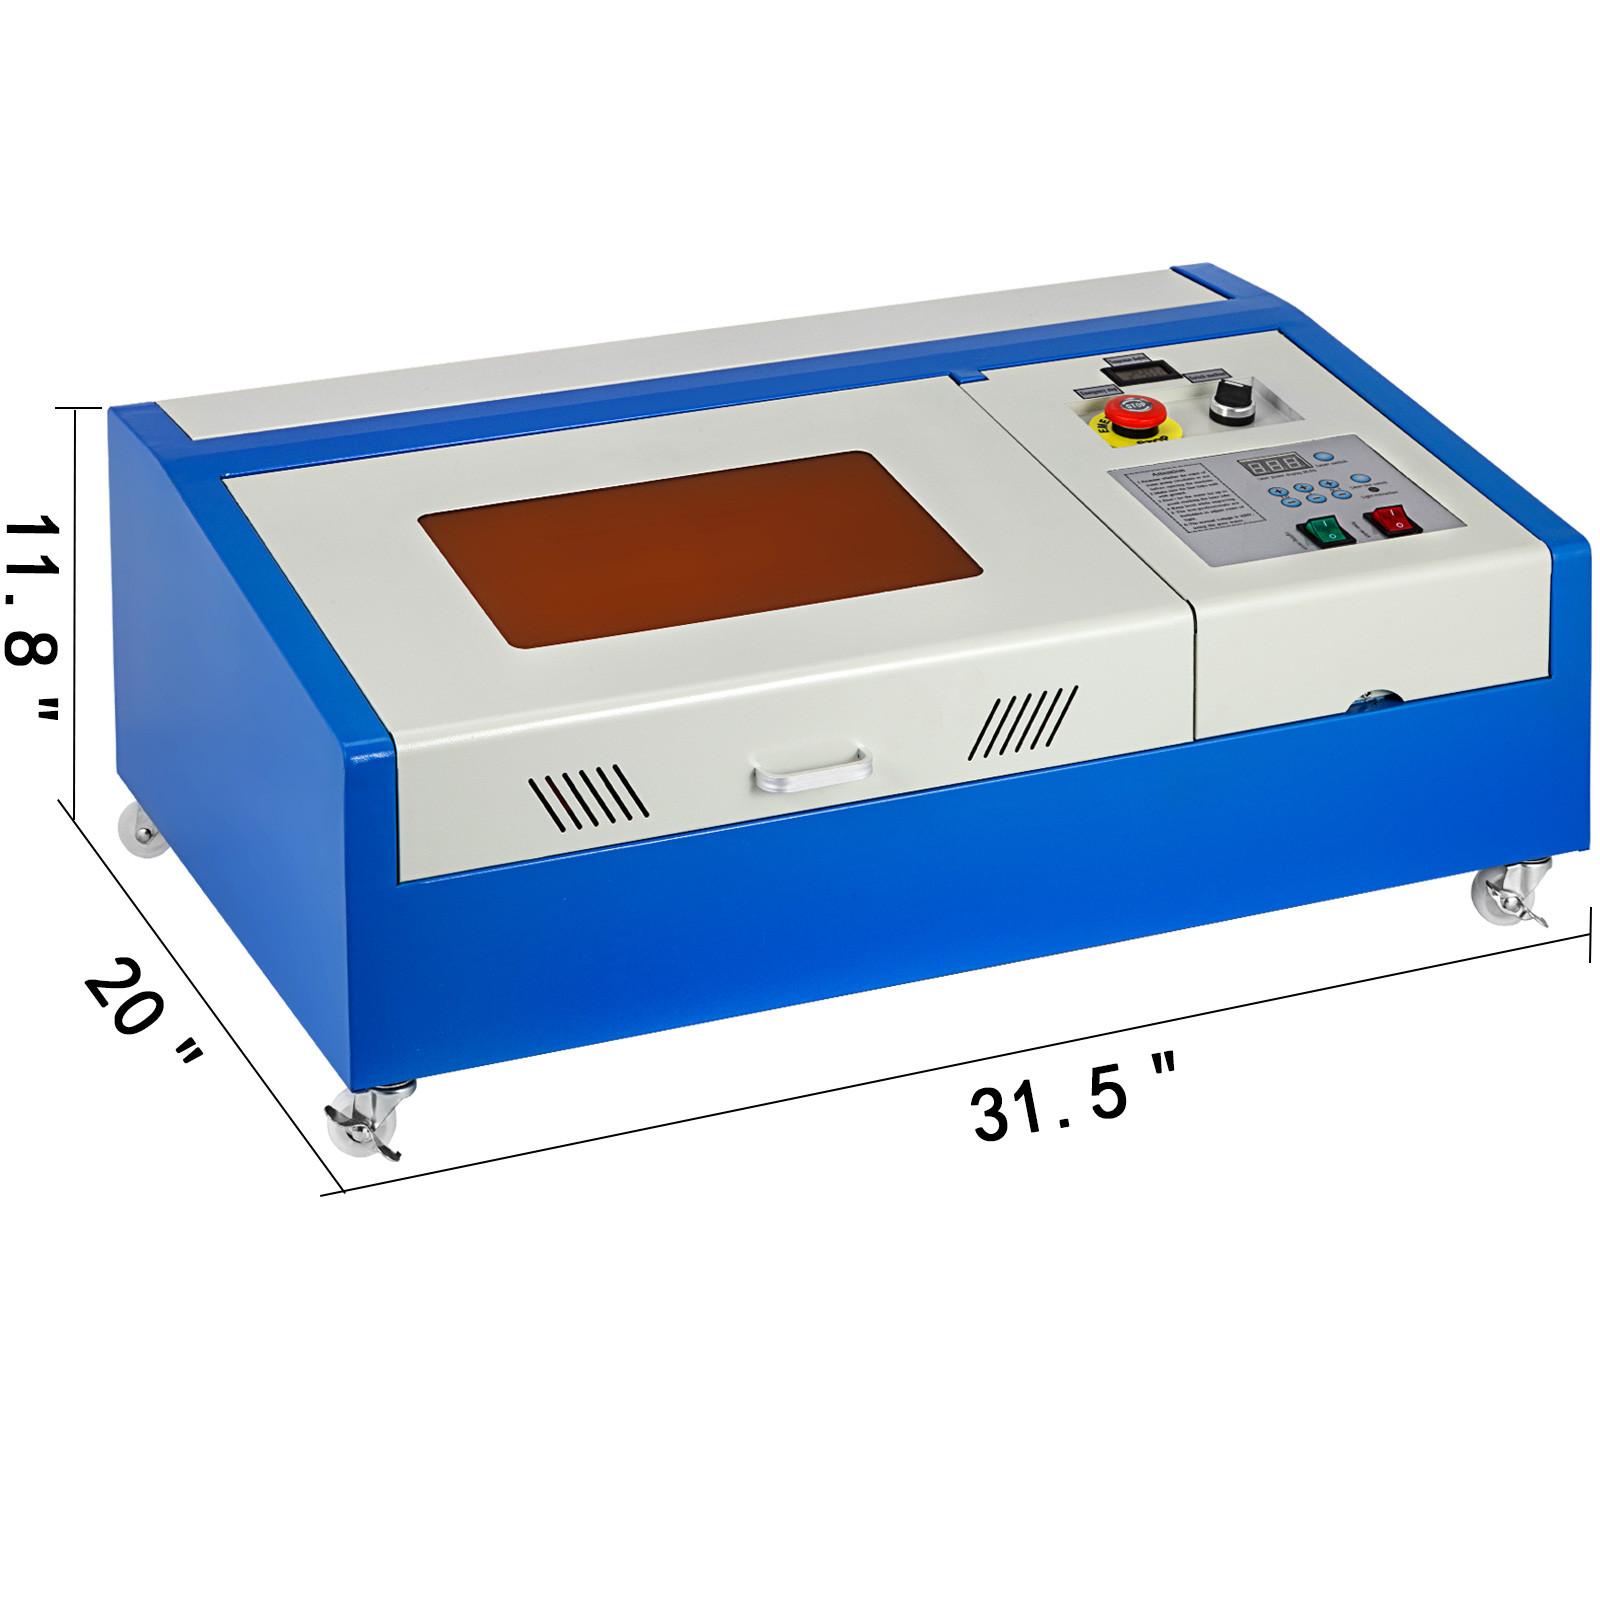 Macchina-per-Incisione-Laser-CO2-40-130W-Asse-Rotante-Tagliatrice-Incisore miniatura 95